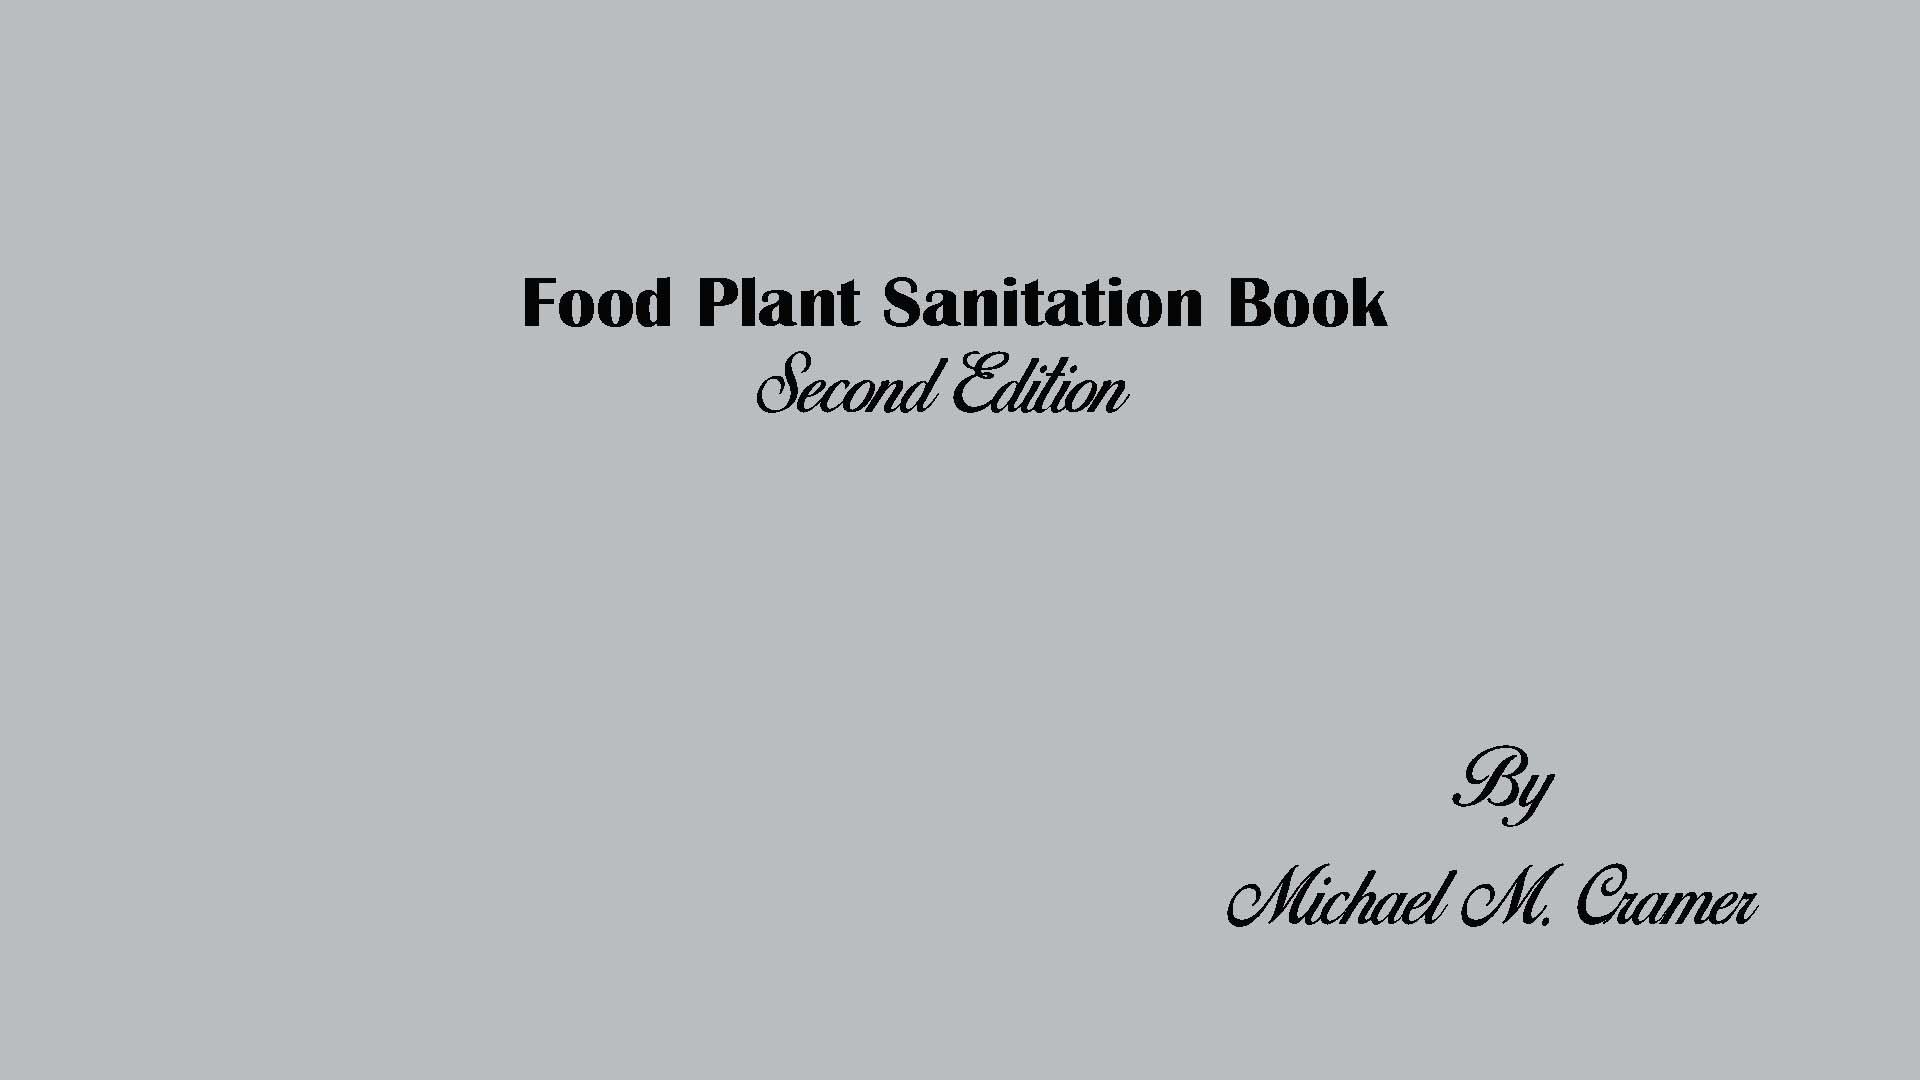 Food Plant Sanitation book